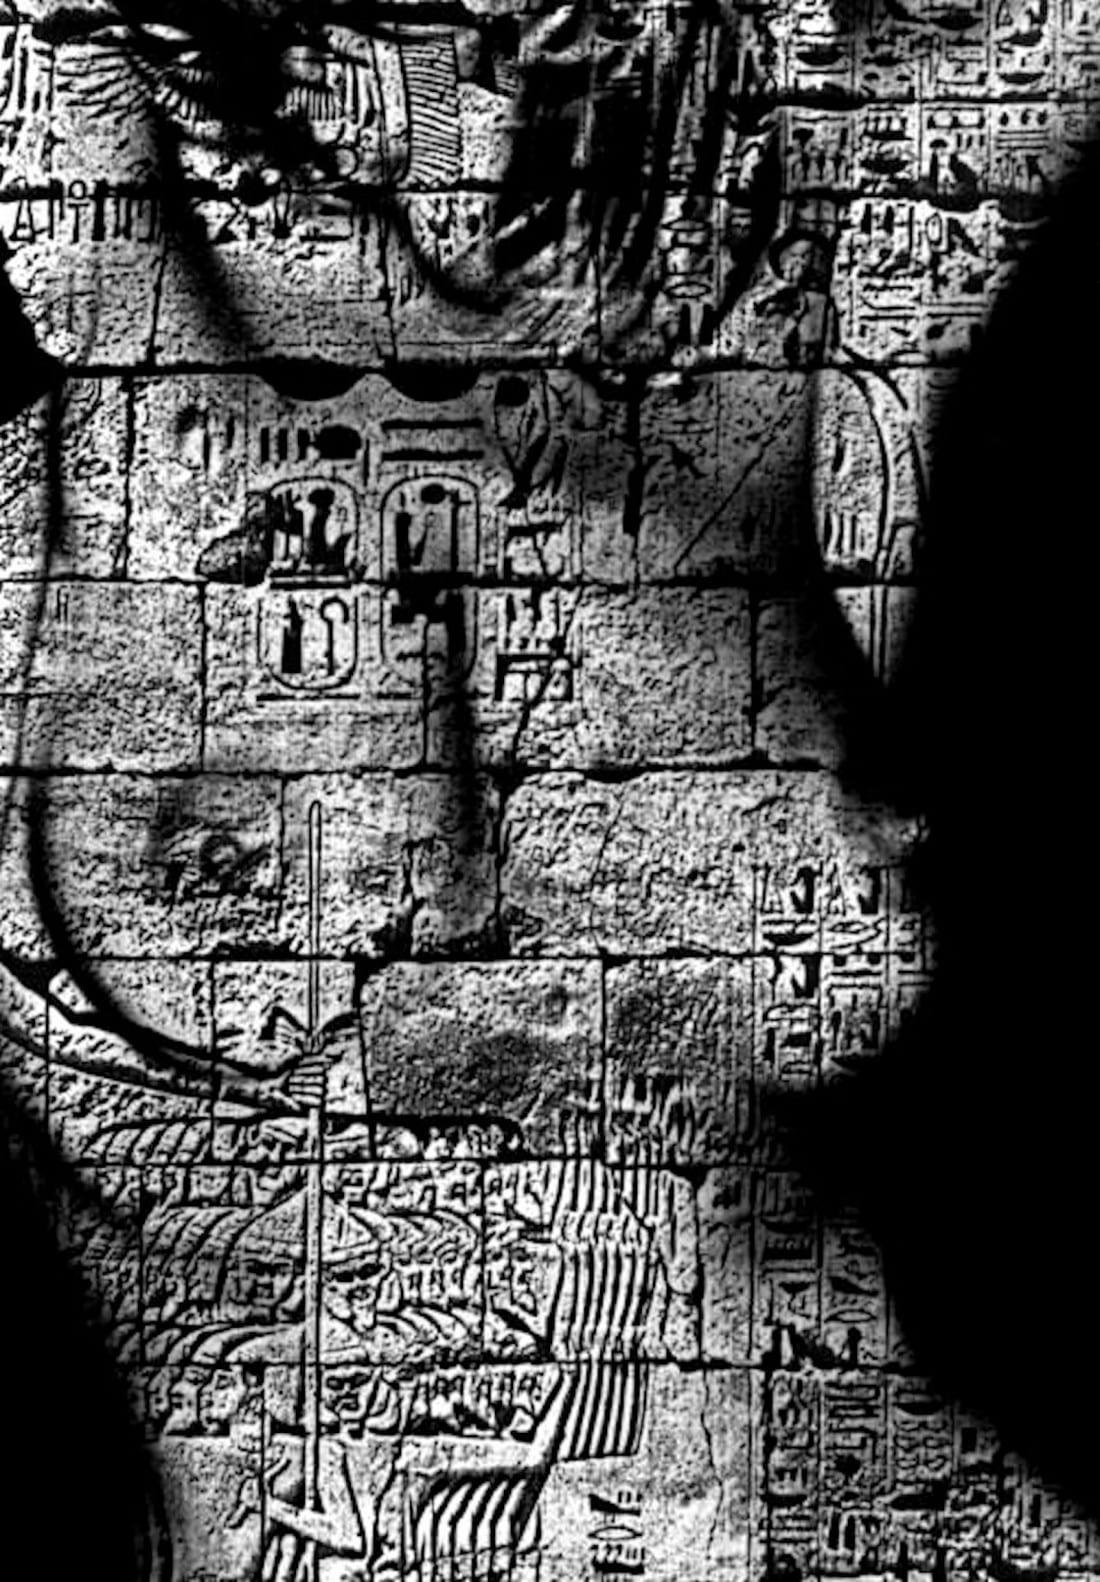 Egypt Nude – 16 x 20